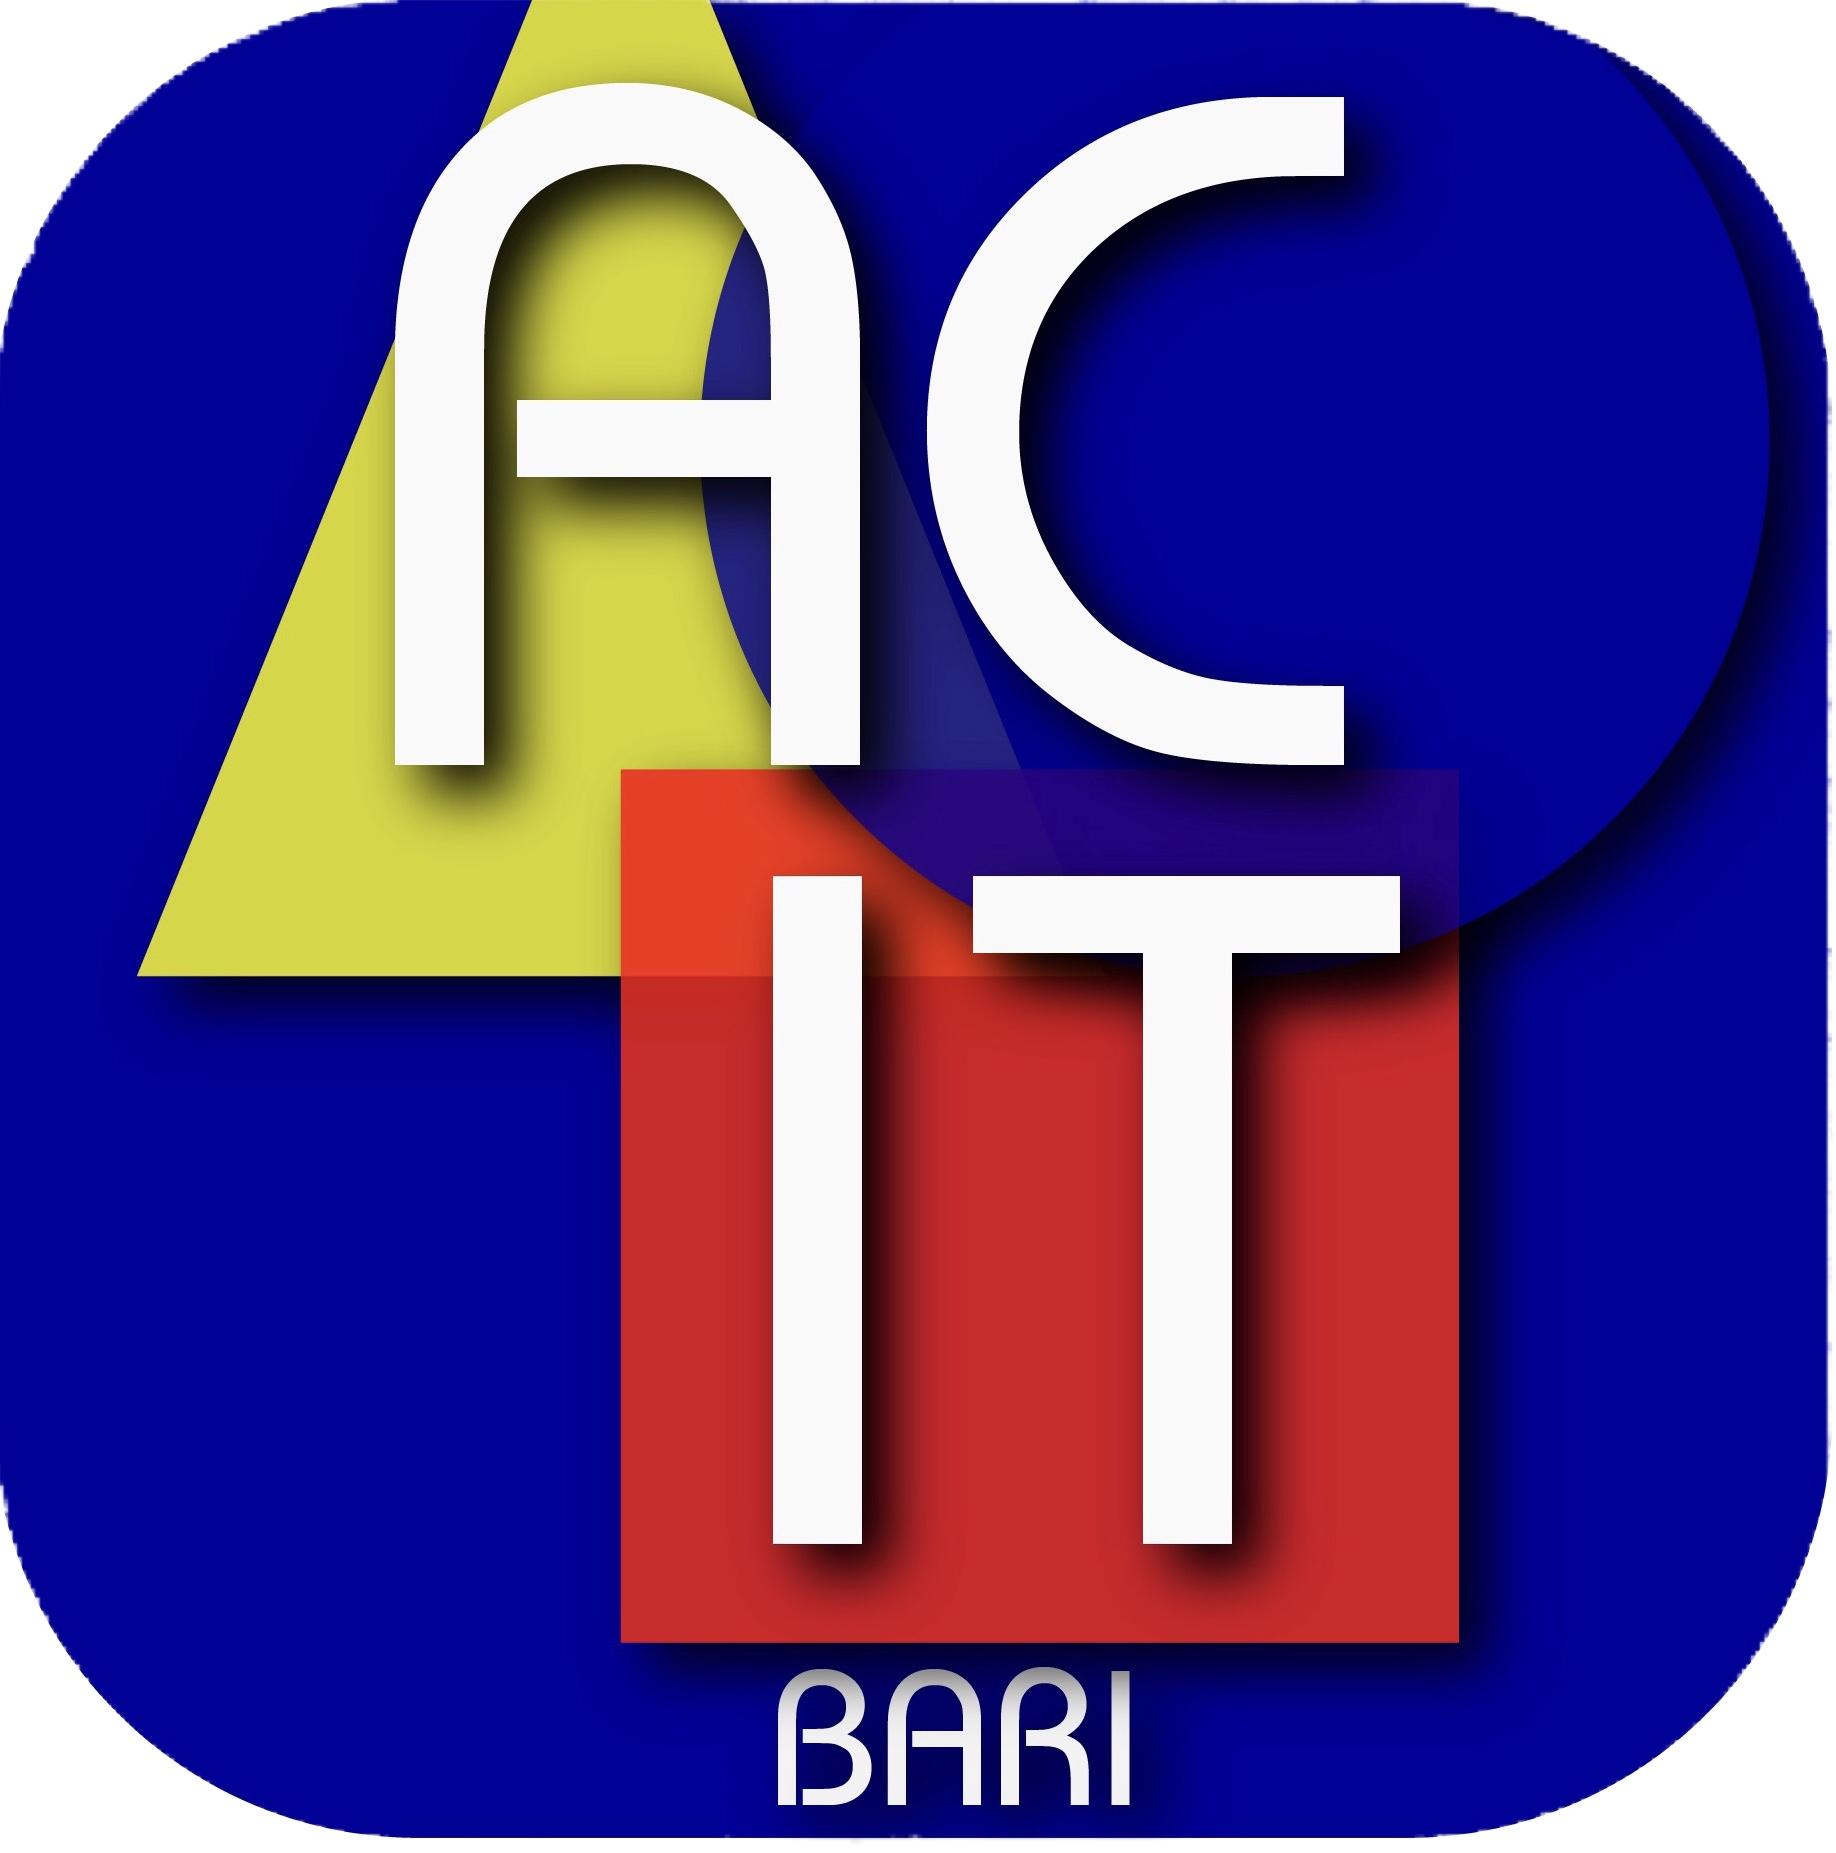 Associazione Culturale Italo-Tedesca di Bari